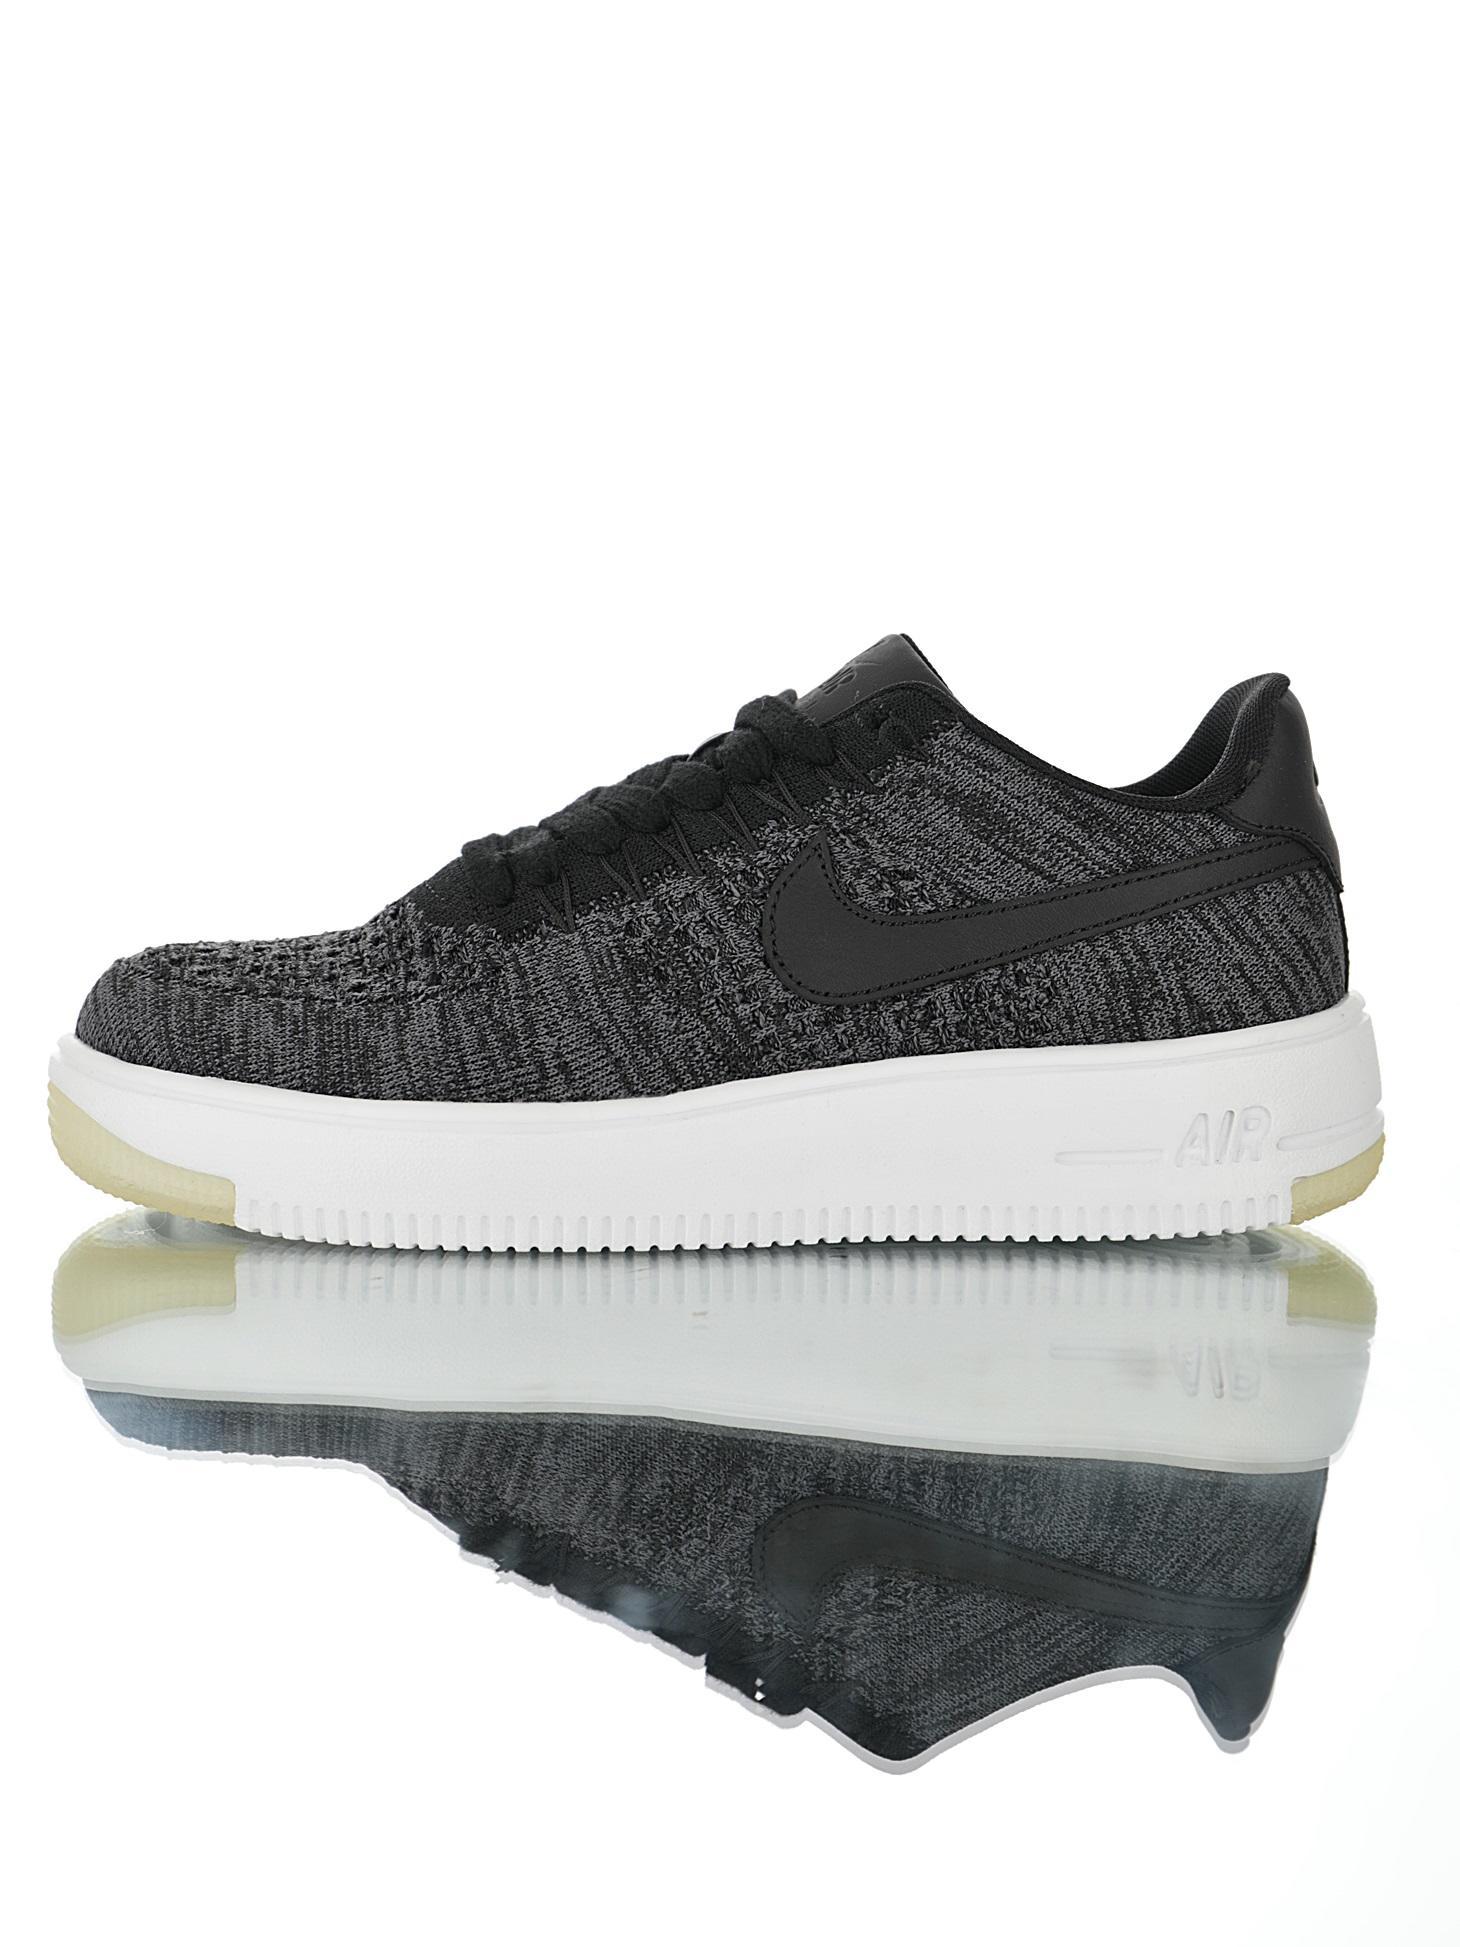 "Nike Air Force 1 Flyknit""Grey Black White""2.0"